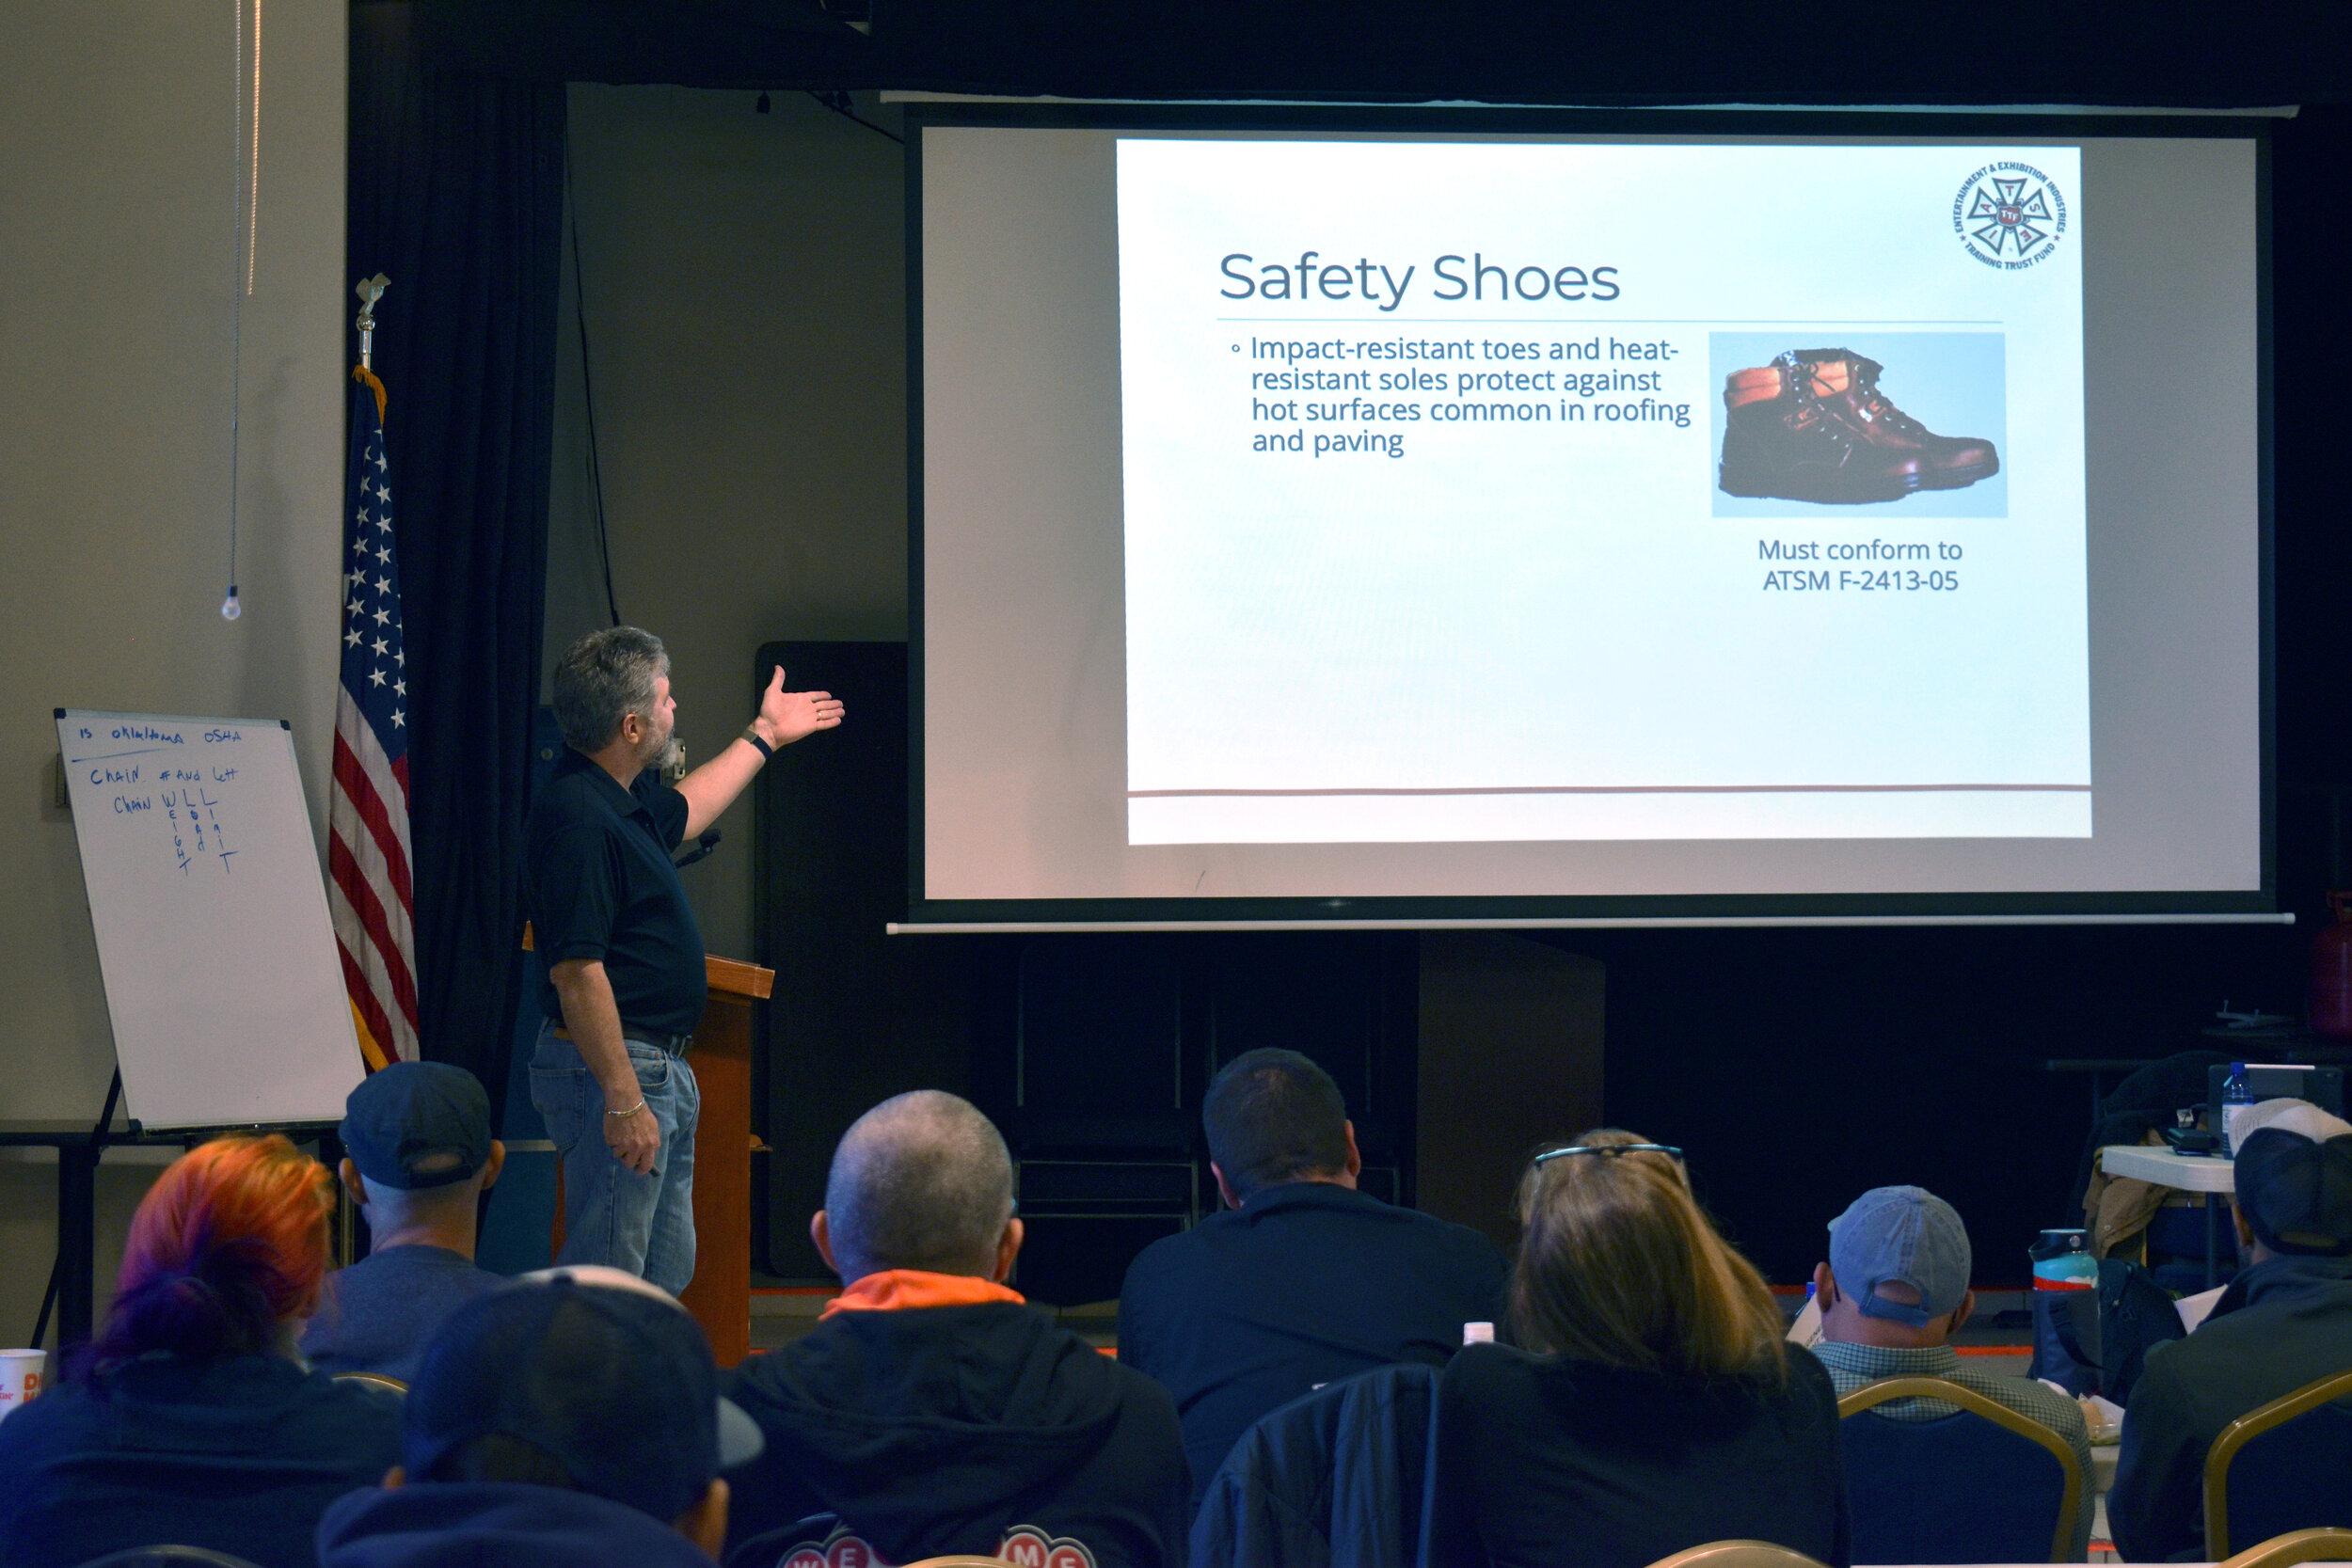 IATSE TTF OSHA 10/General Entertainment Safety in Santa Fe, NM | October 12-13, 2019